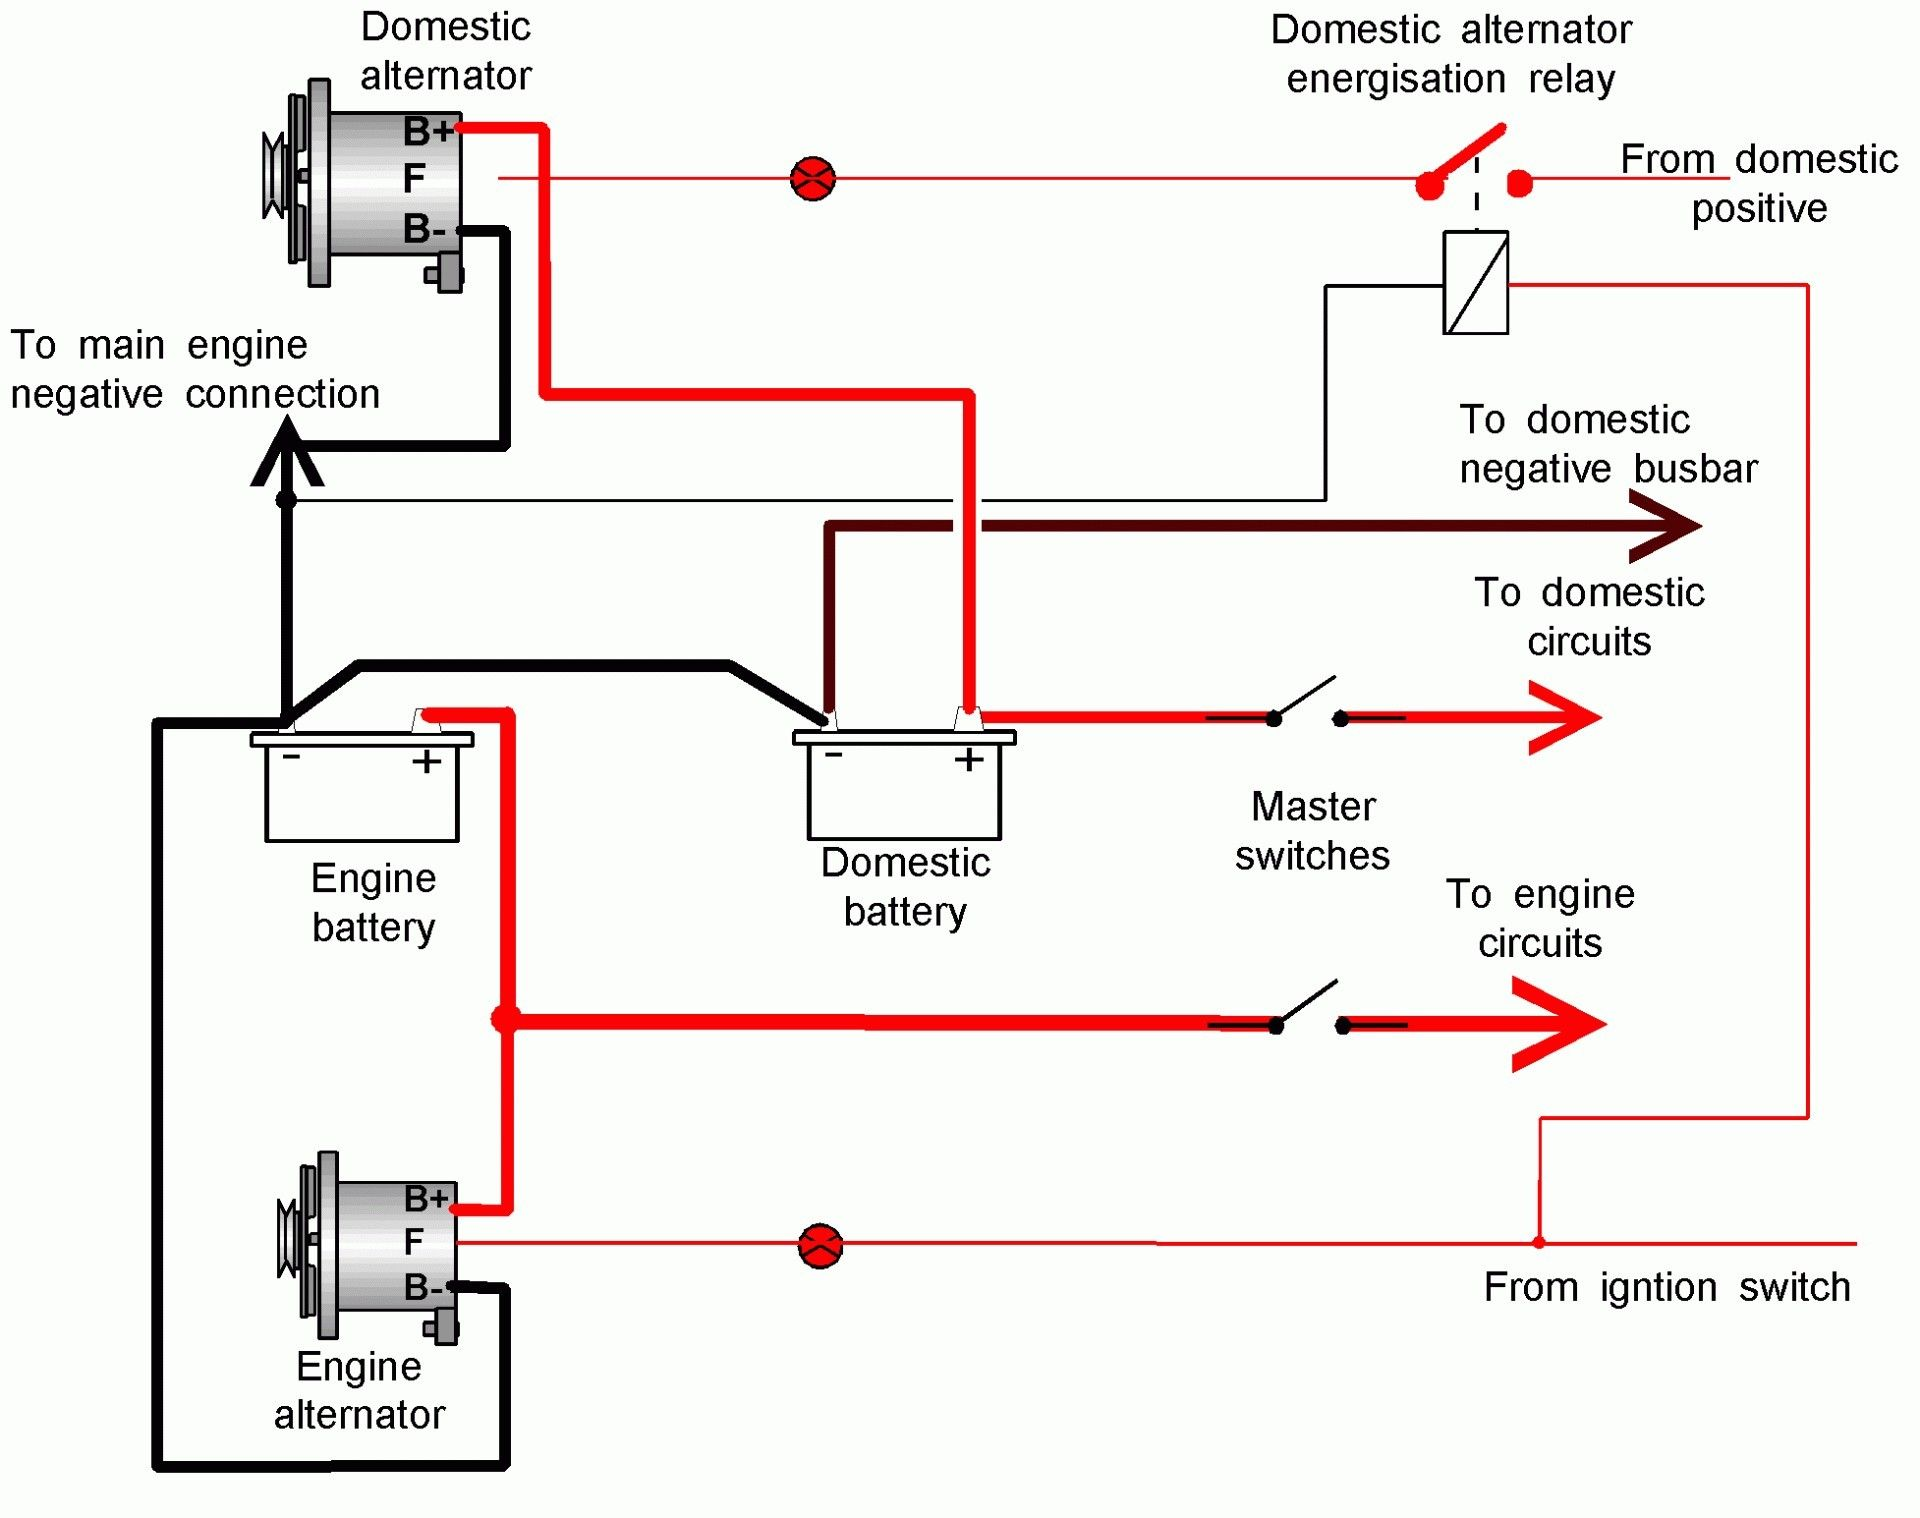 50+ Chevy 350 Starter Wiring Diagram Texas in 2021 | Electrical circuit  diagram, Electrical diagram, Alternator | Chevy 350 Starter Wiring Diagram |  | Pinterest